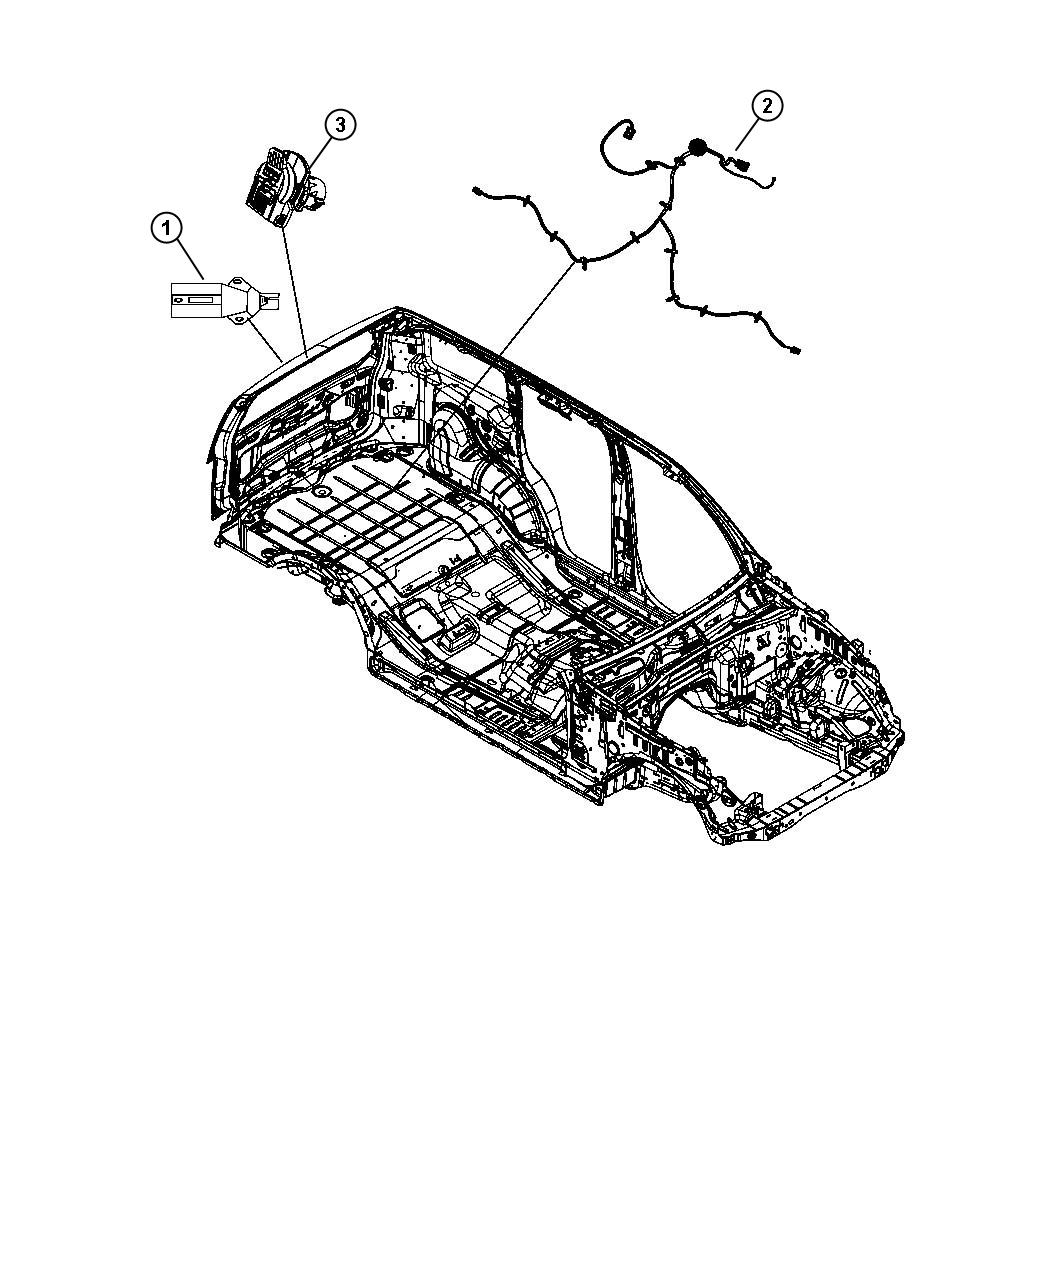 Jeep Liberty Wiring. Fuel tank. [18.5 gallon fuel tank